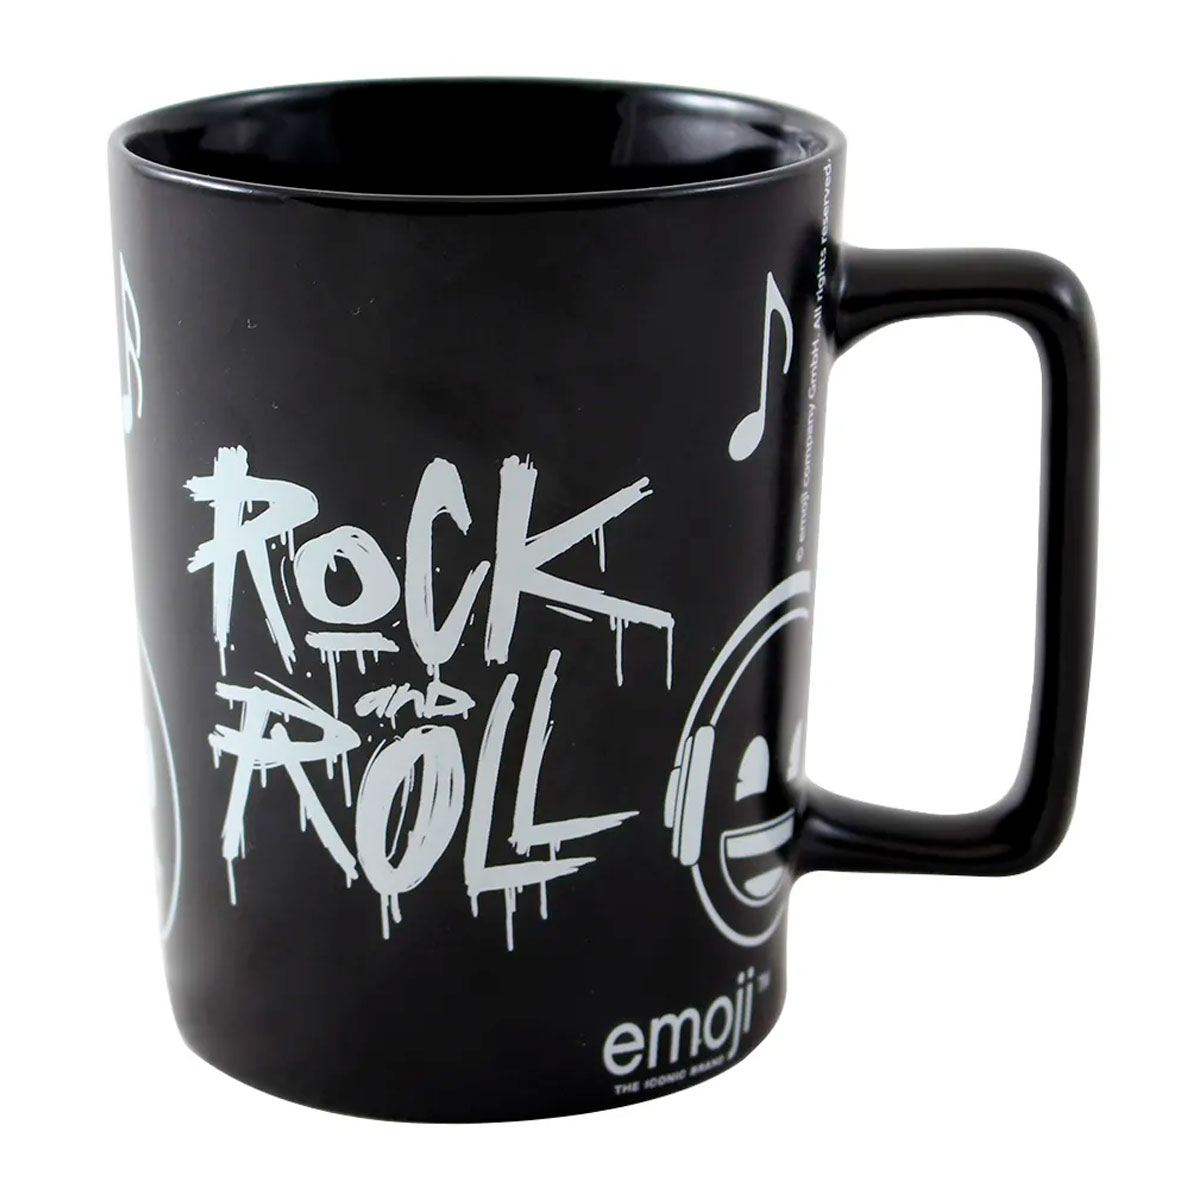 Caneca Alça Quadrada 500 ml Emoji Rock and Roll - Presente Super